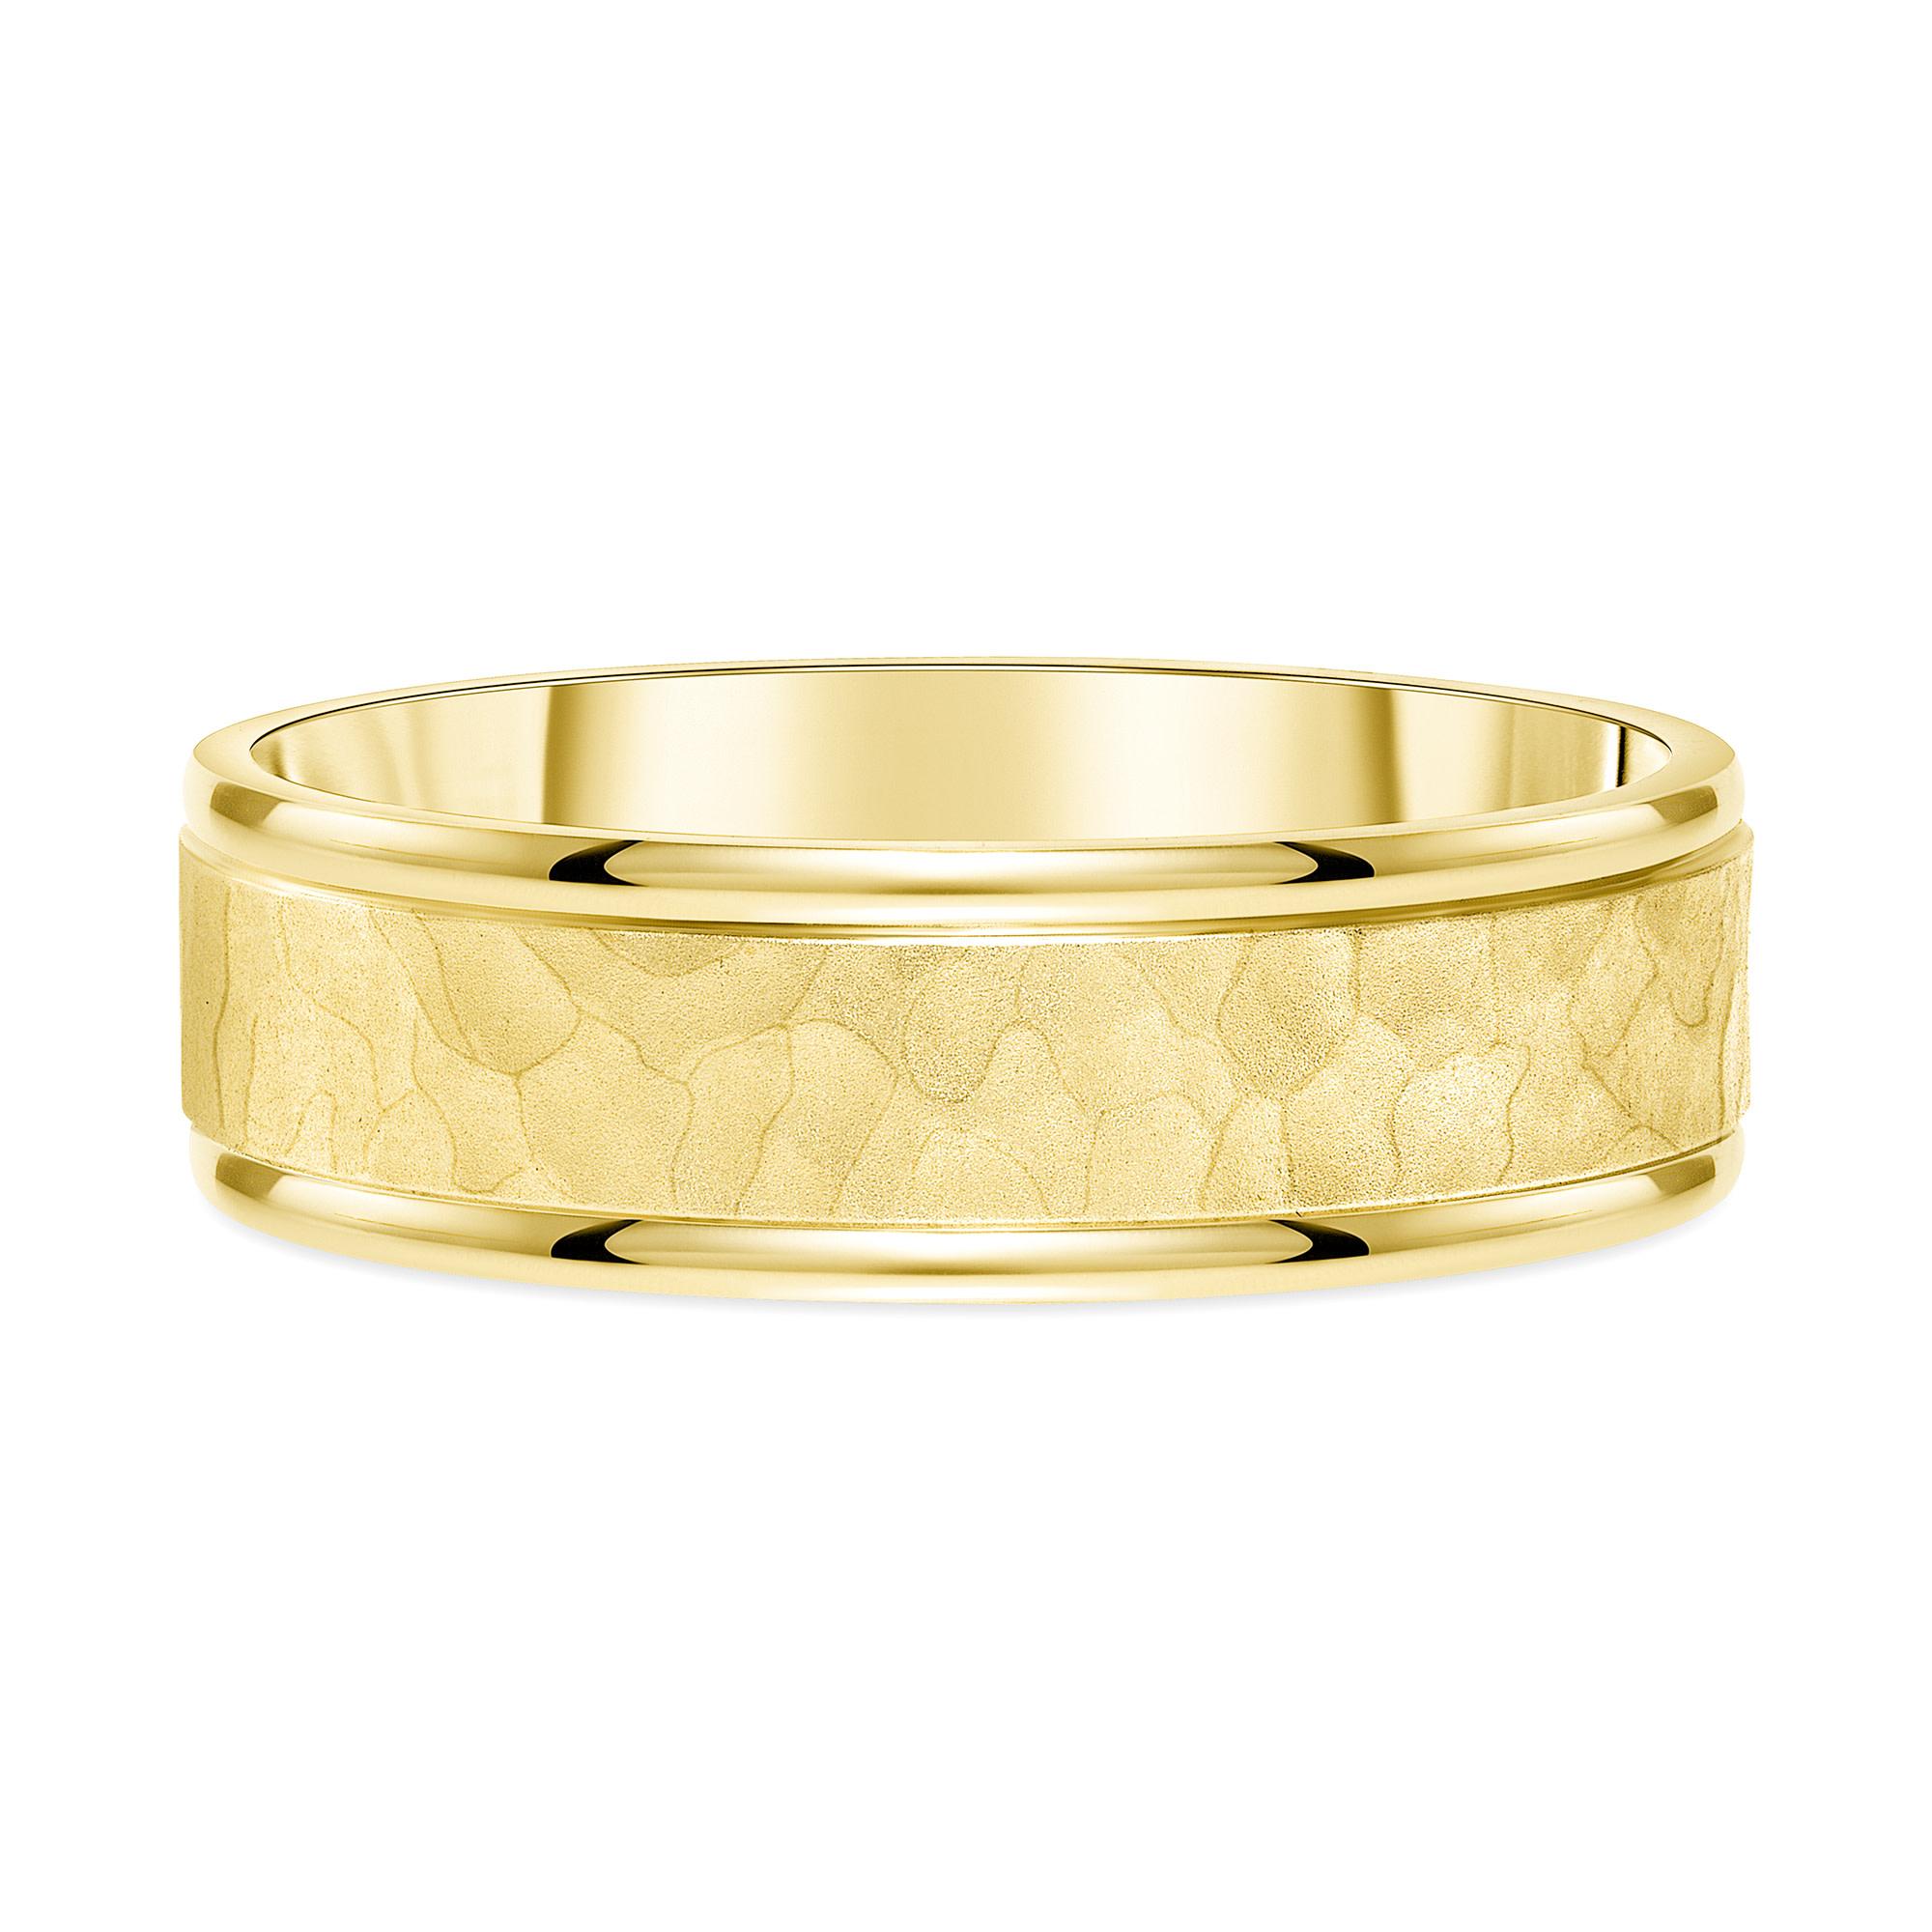 14k gold hammered wedding band   14k mens wedding band